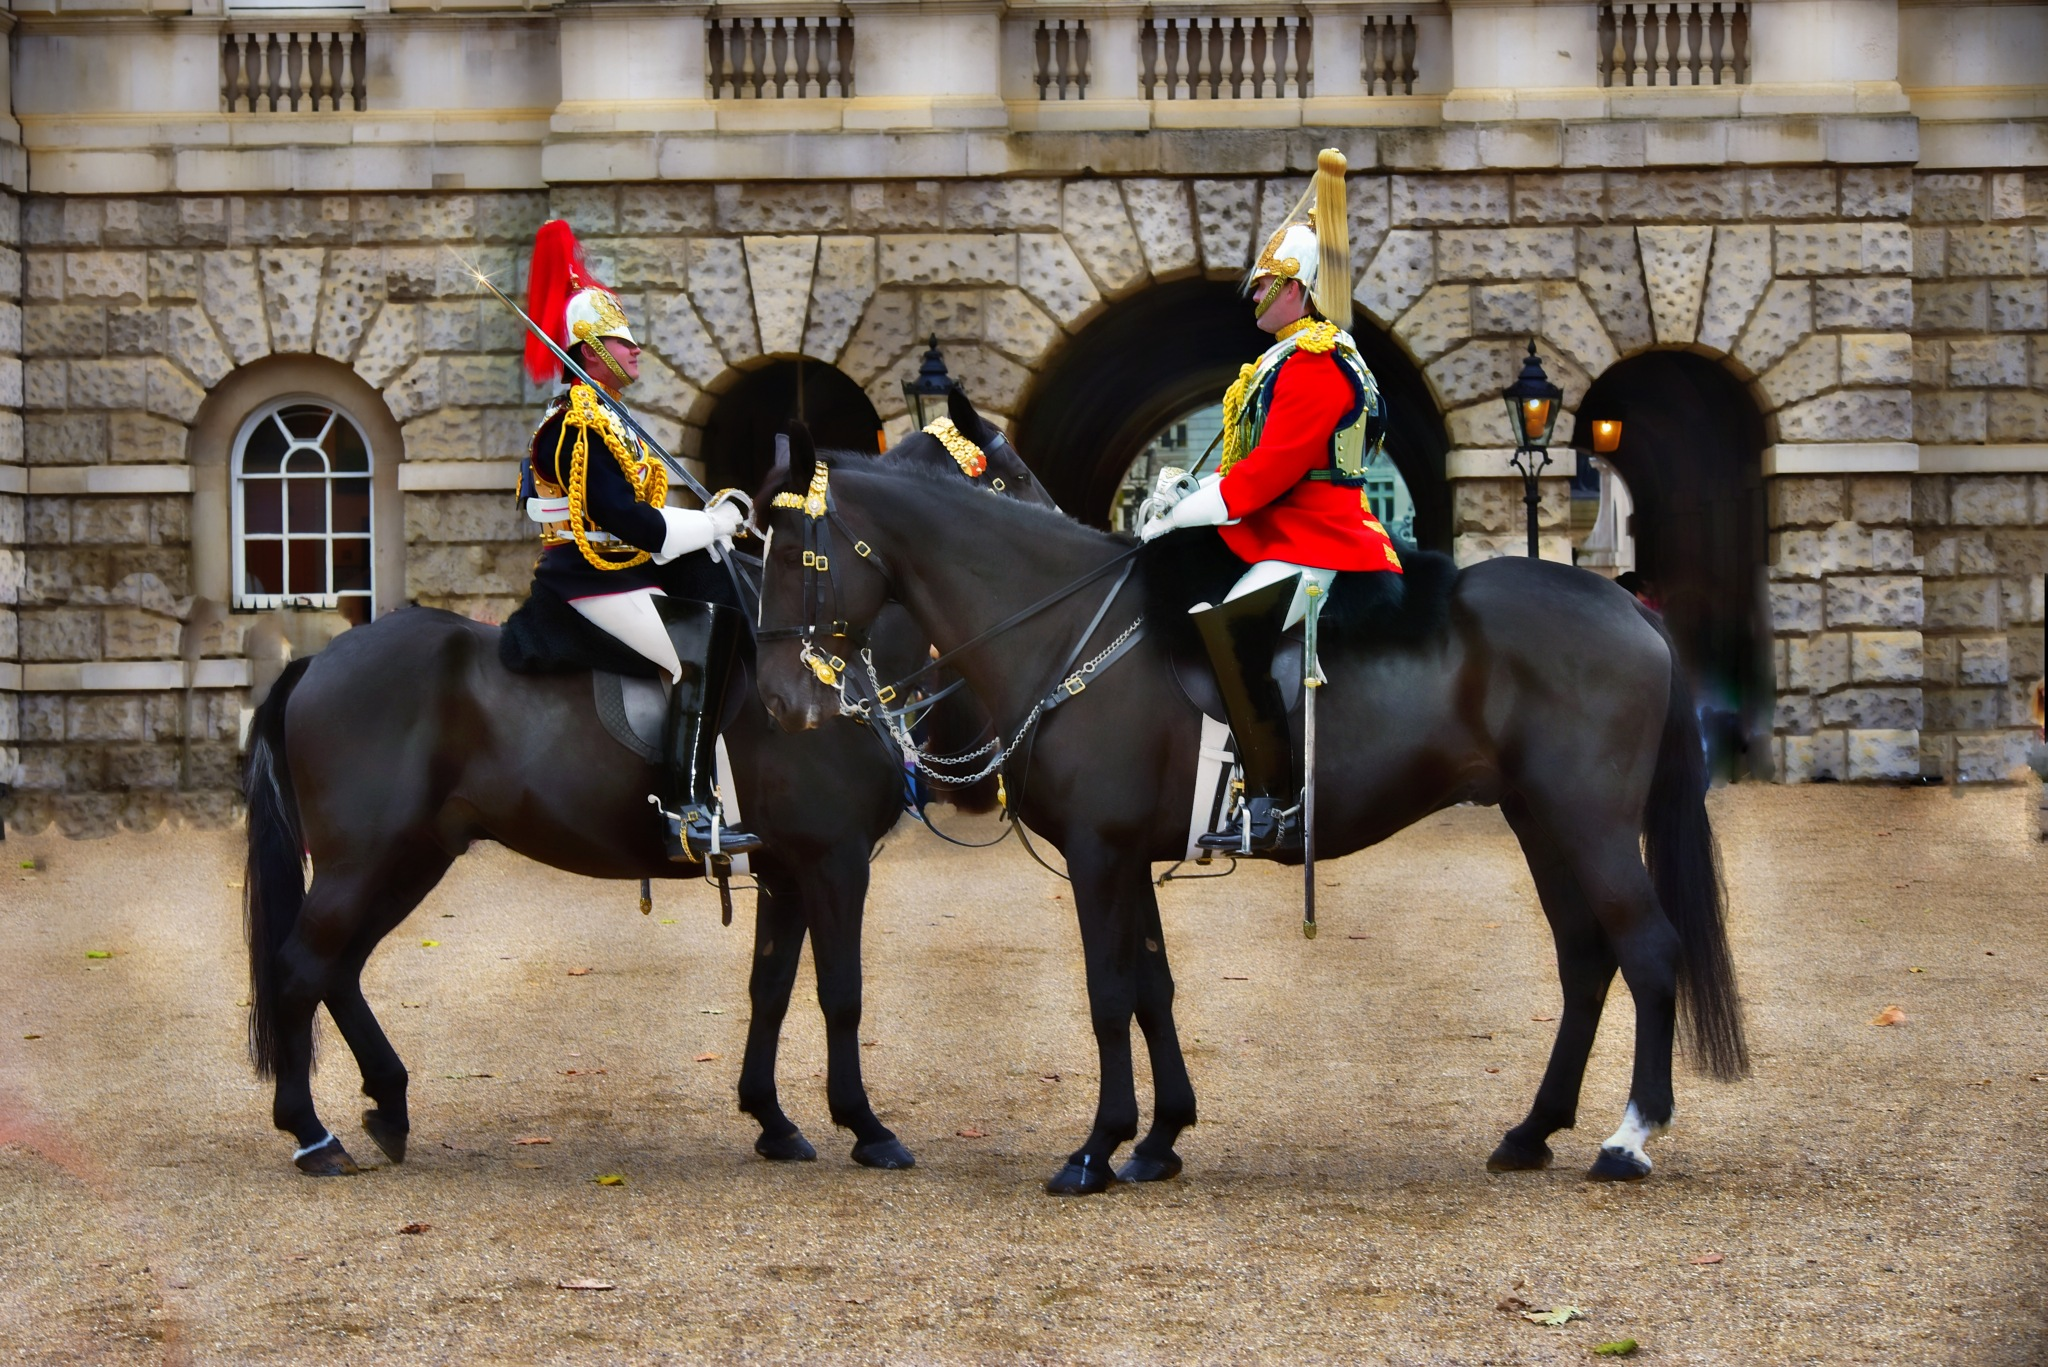 changing of guard, London by VLADKOTLIS